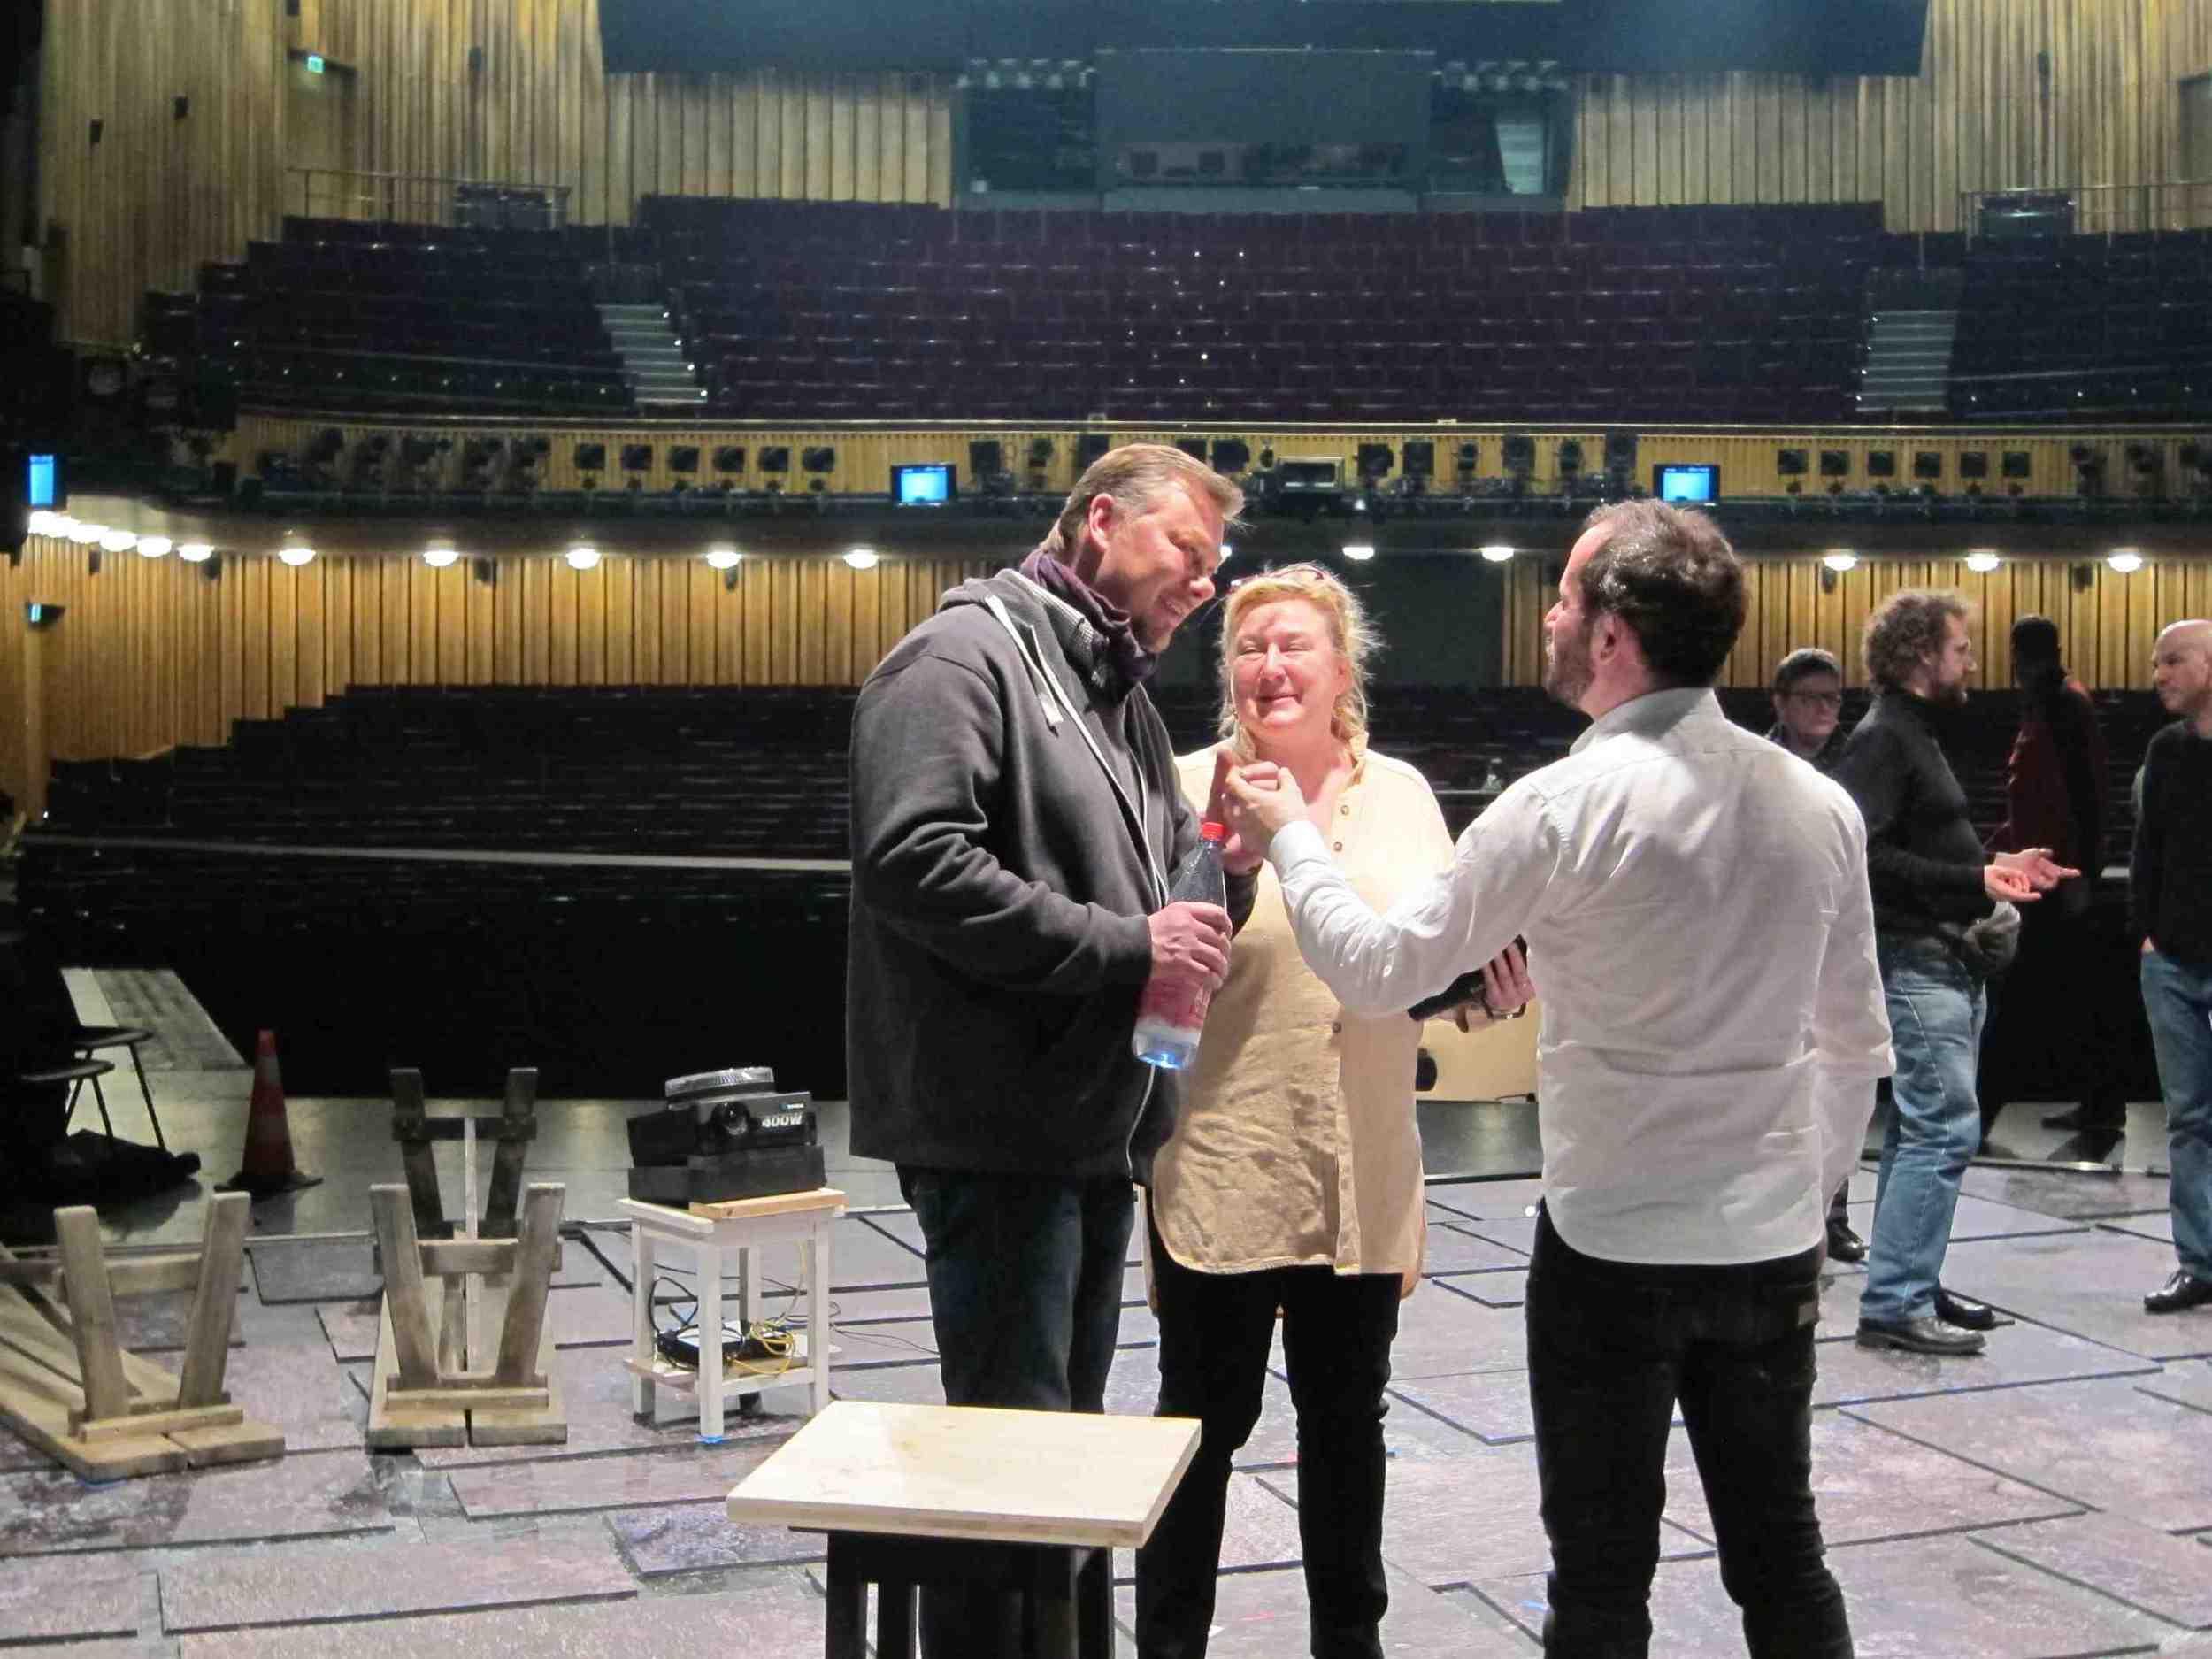 7_Rene_onstage_with_director_Dmitri_Tcherniakov.jpg